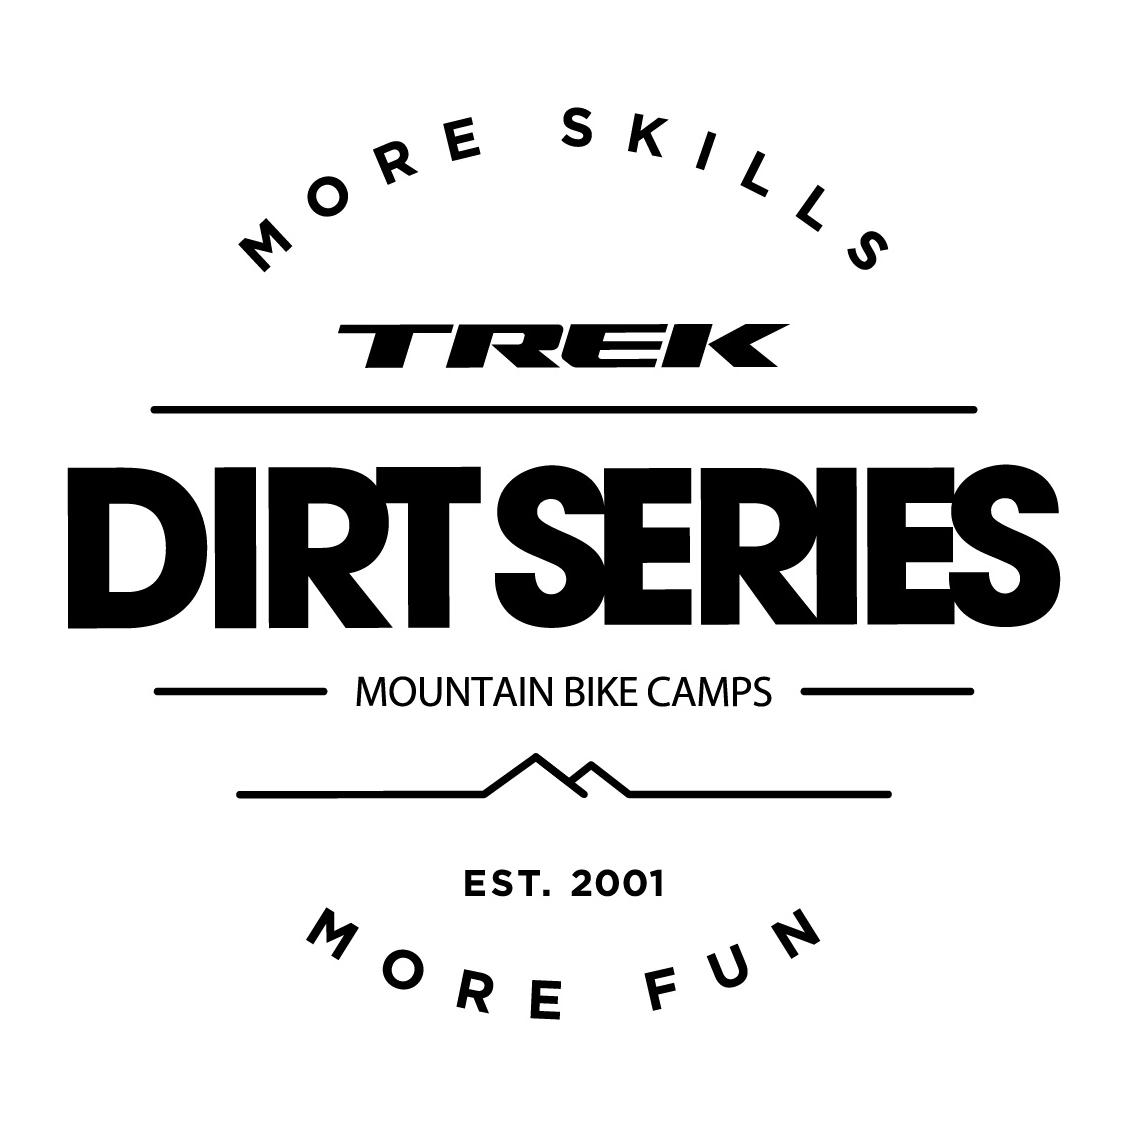 Dirt Series Mountain Bike Camp - Edmonton, AB